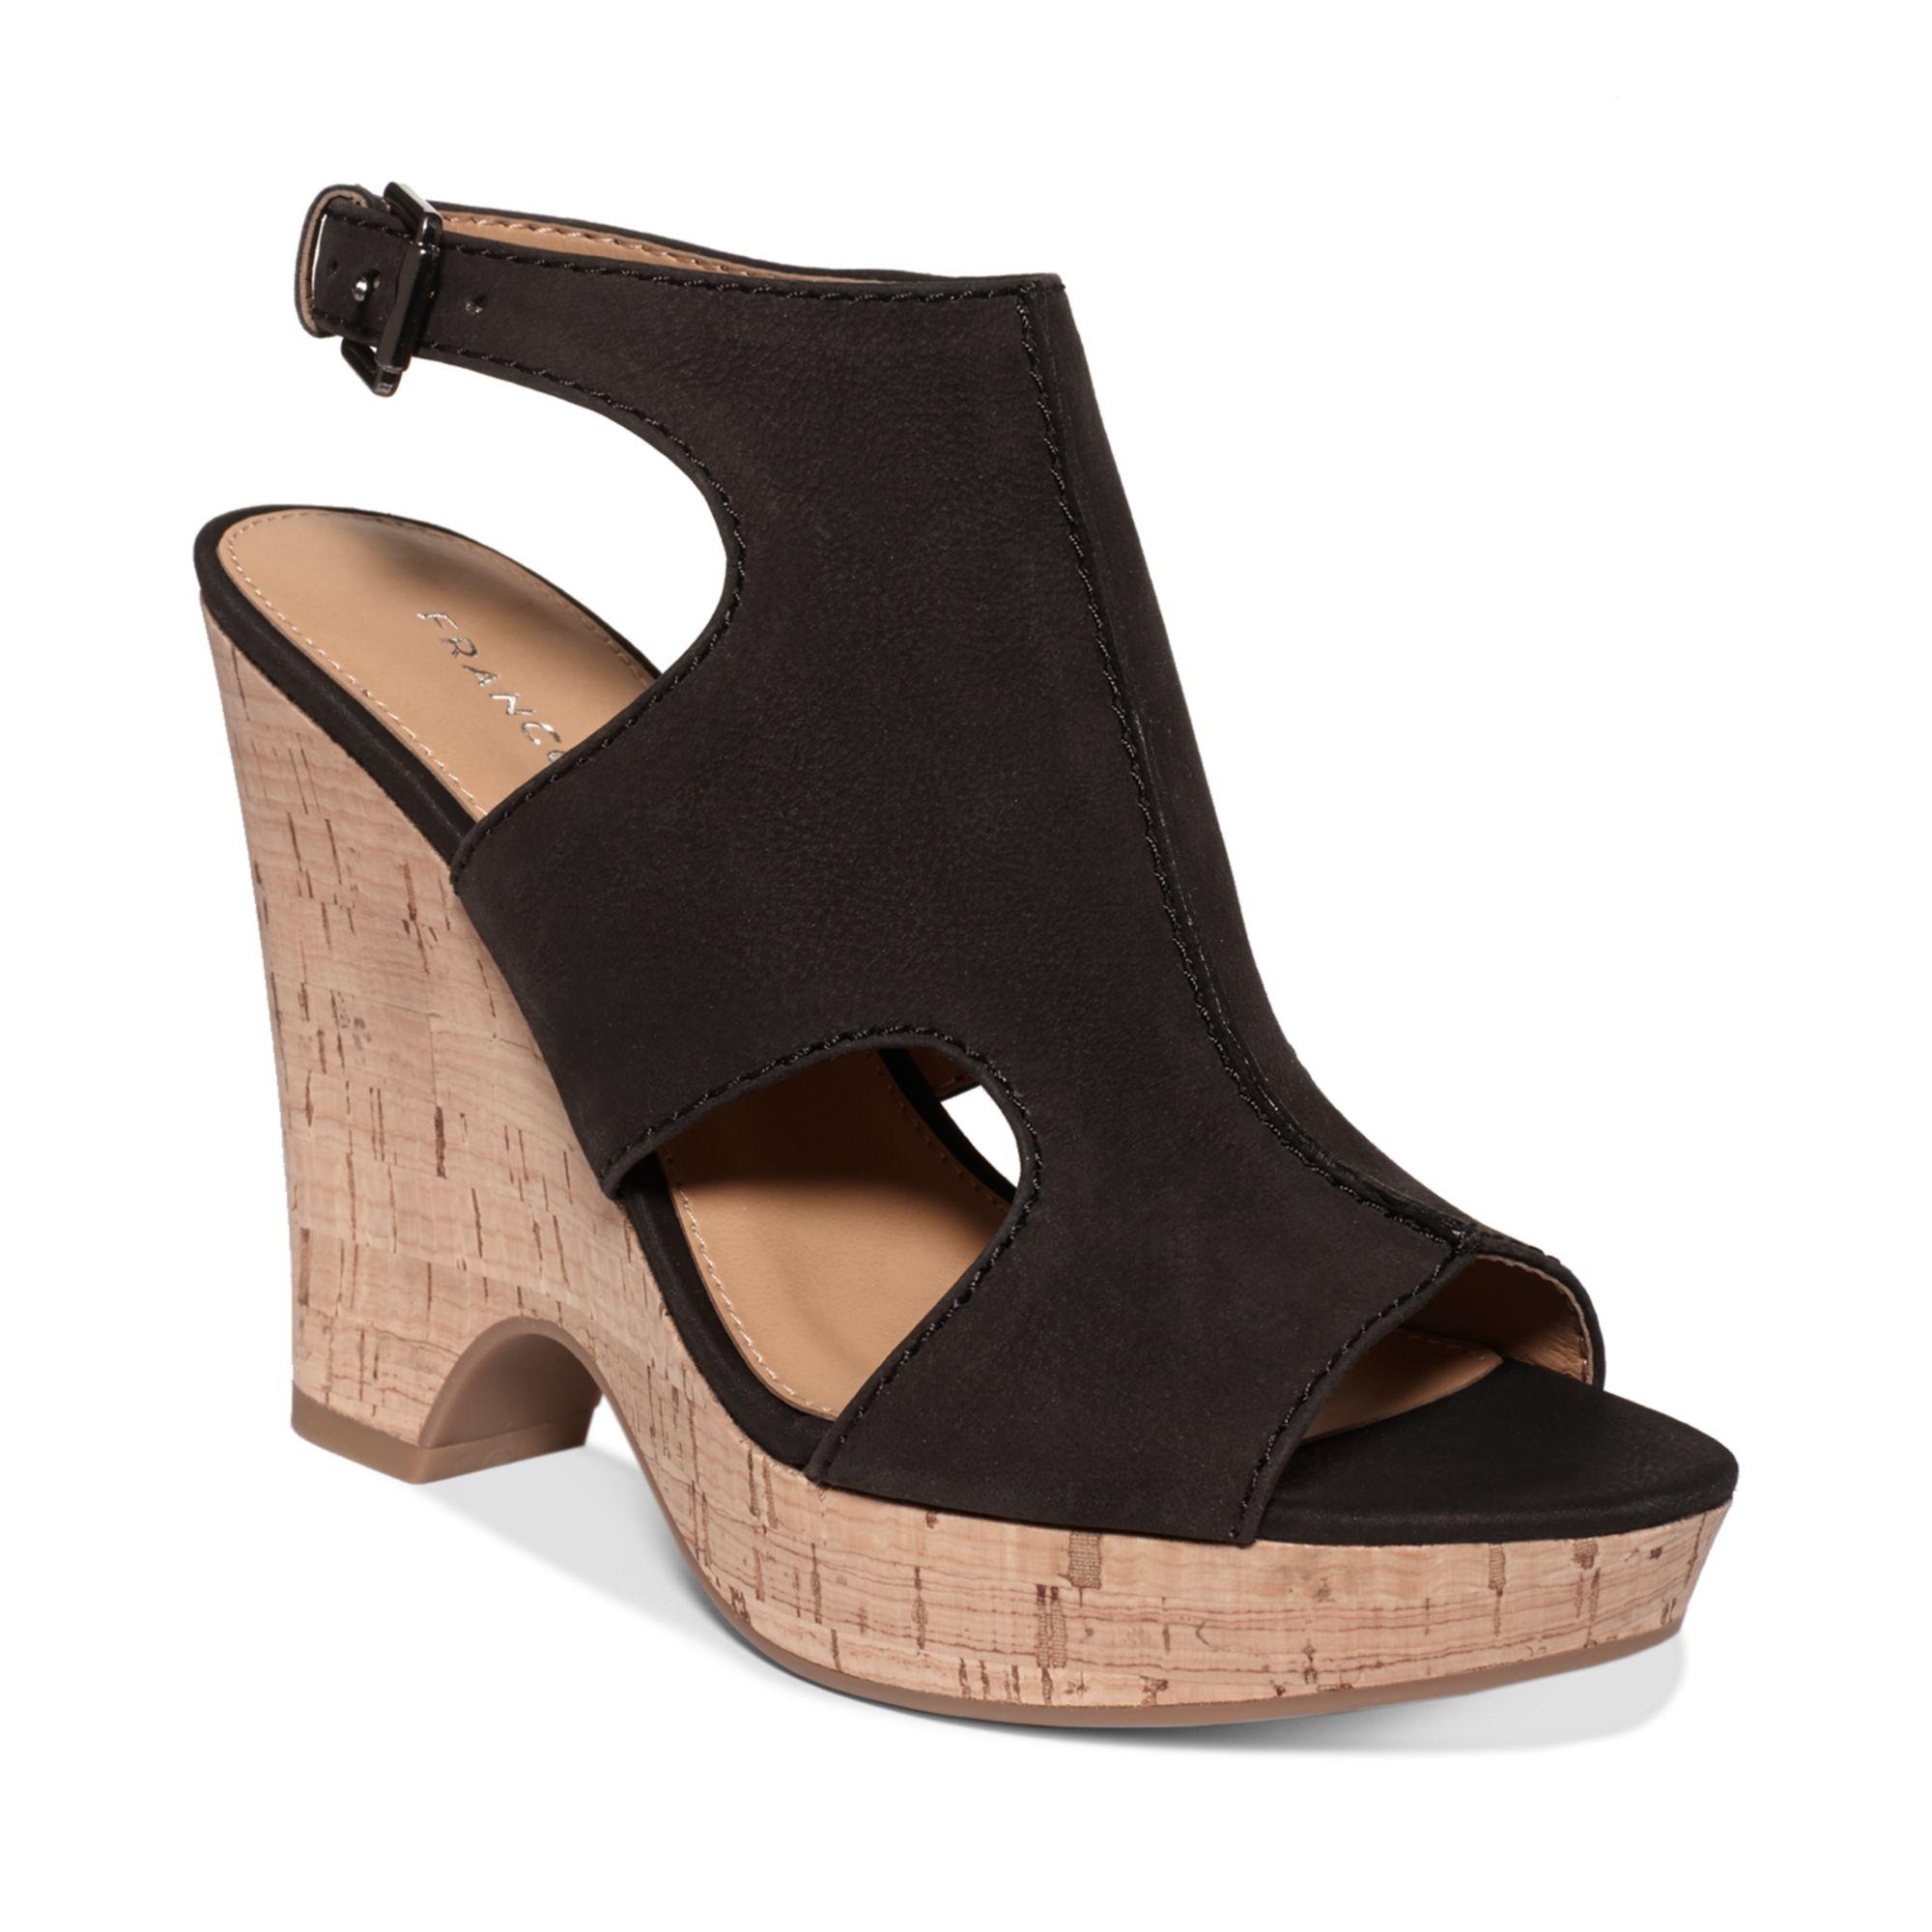 lyst franco sarto glamour platform wedge sandals in black